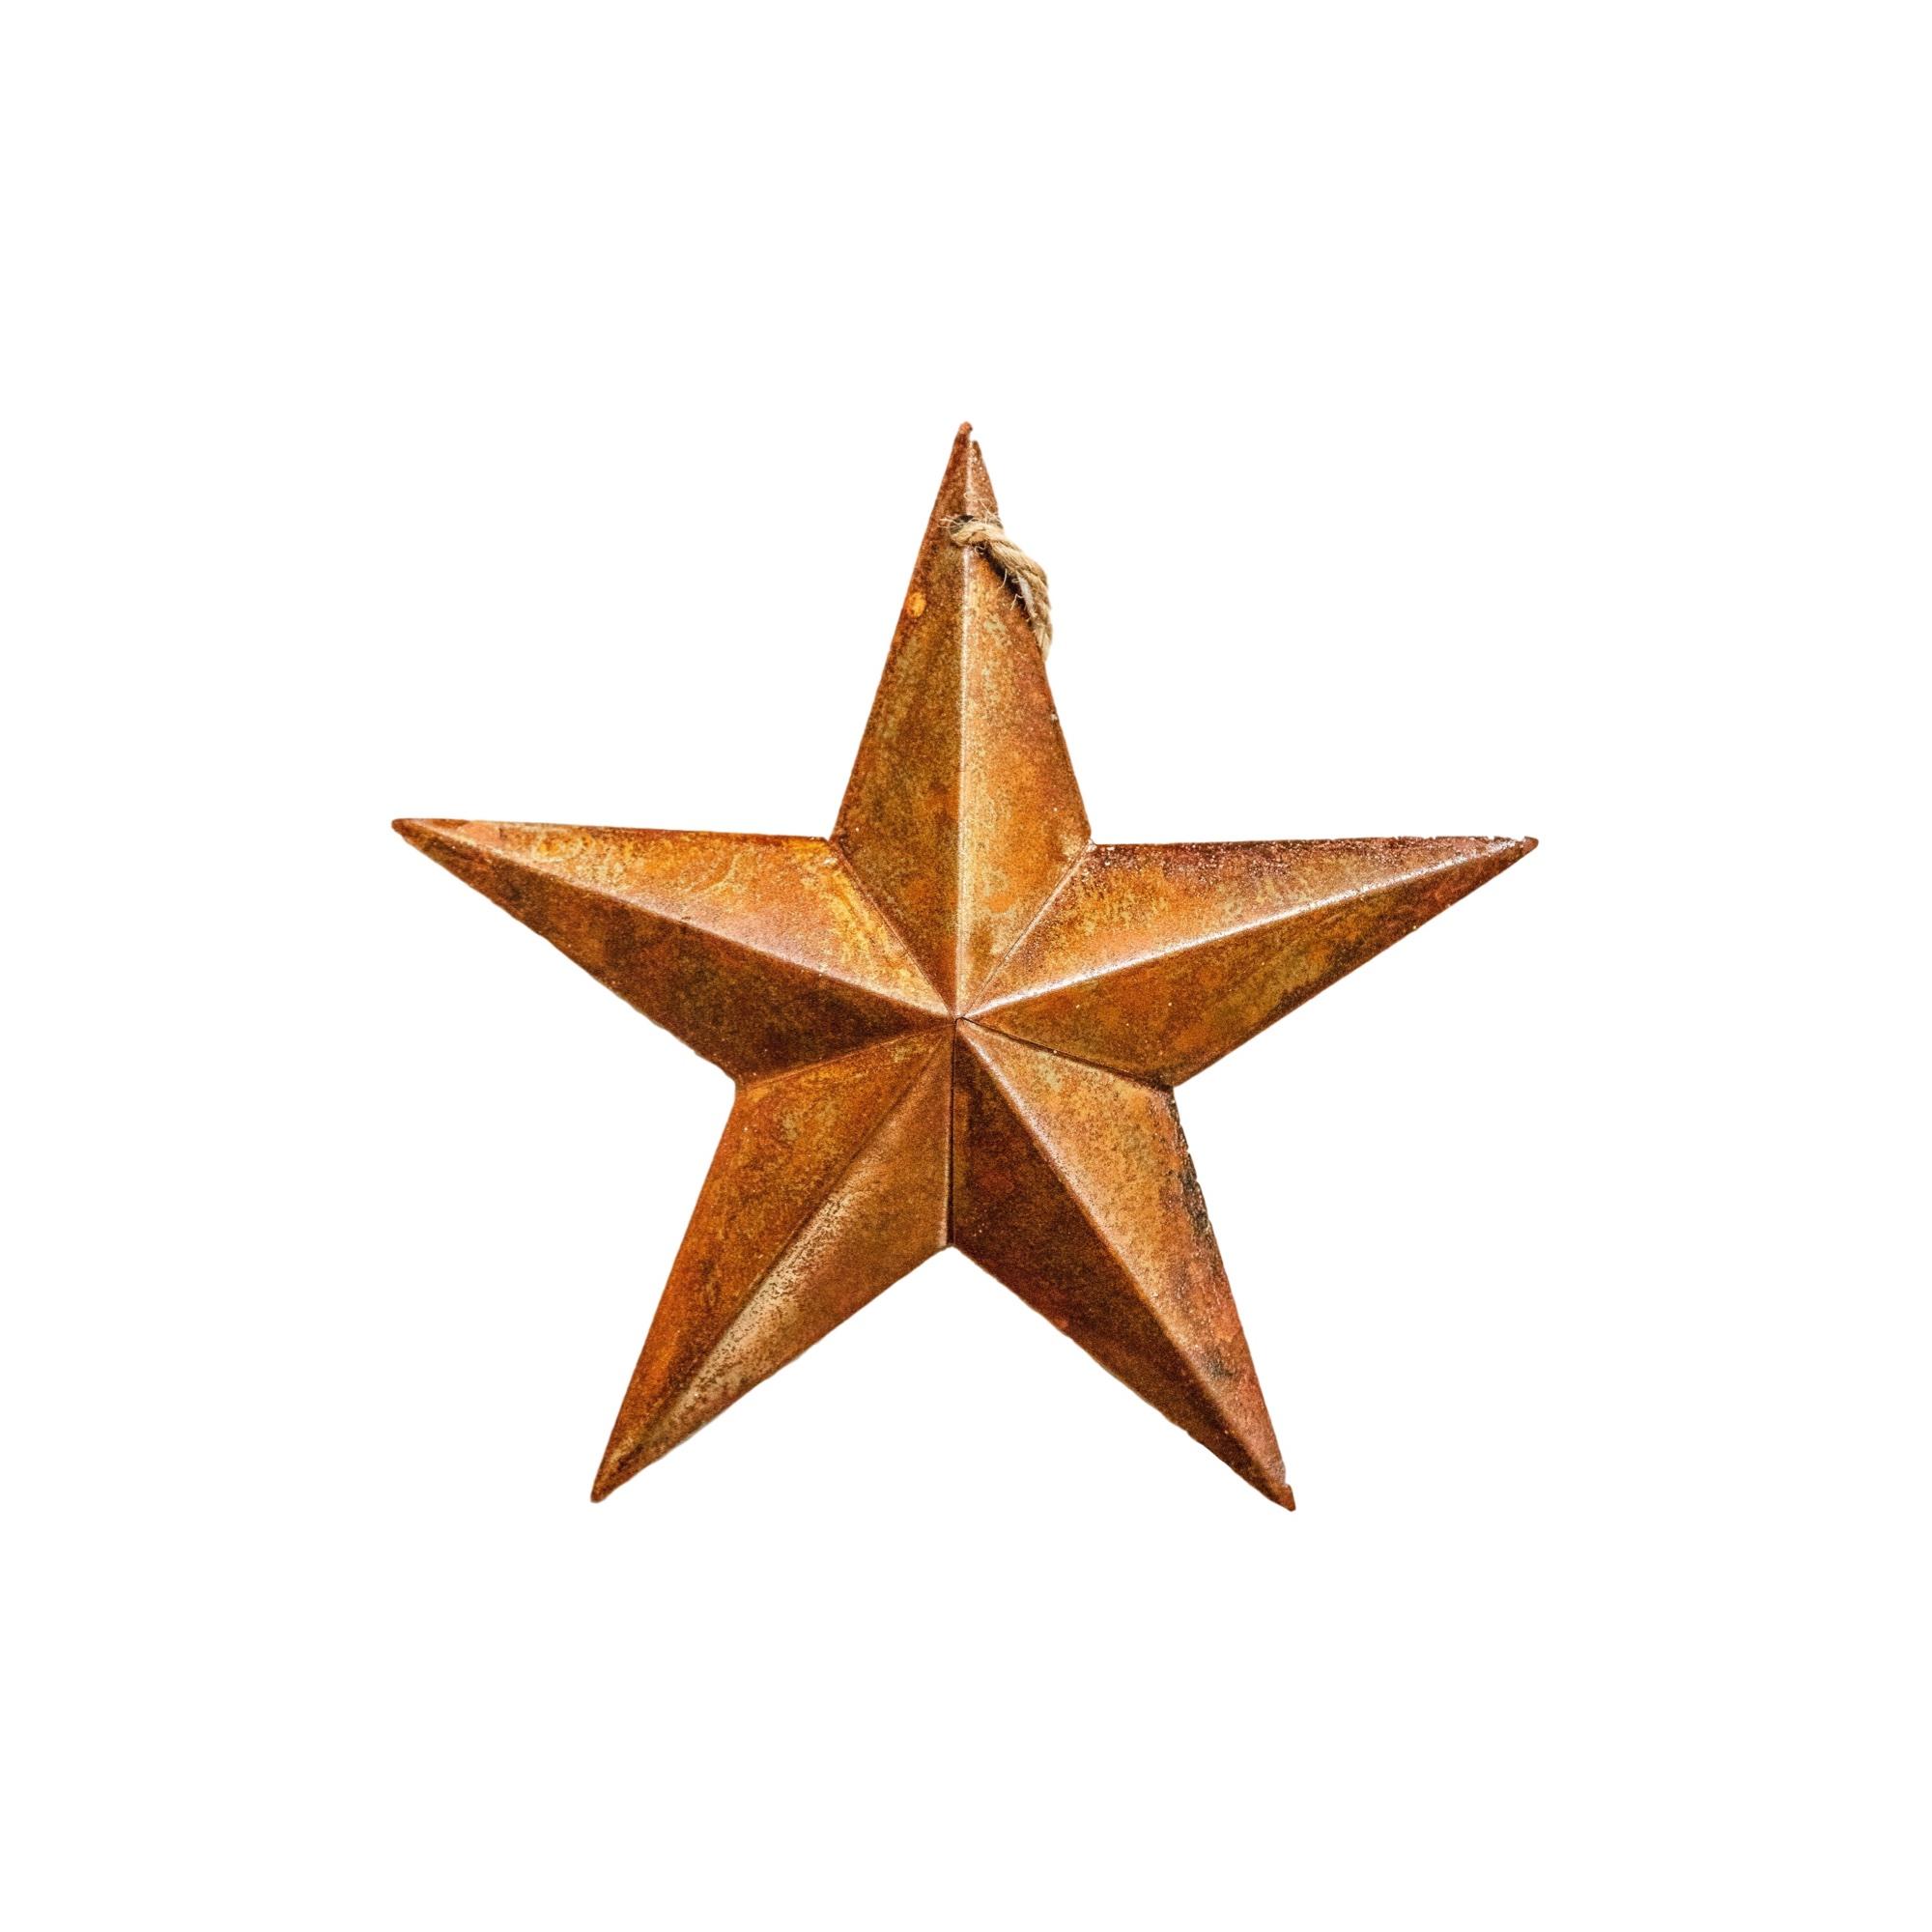 7in Copper Star